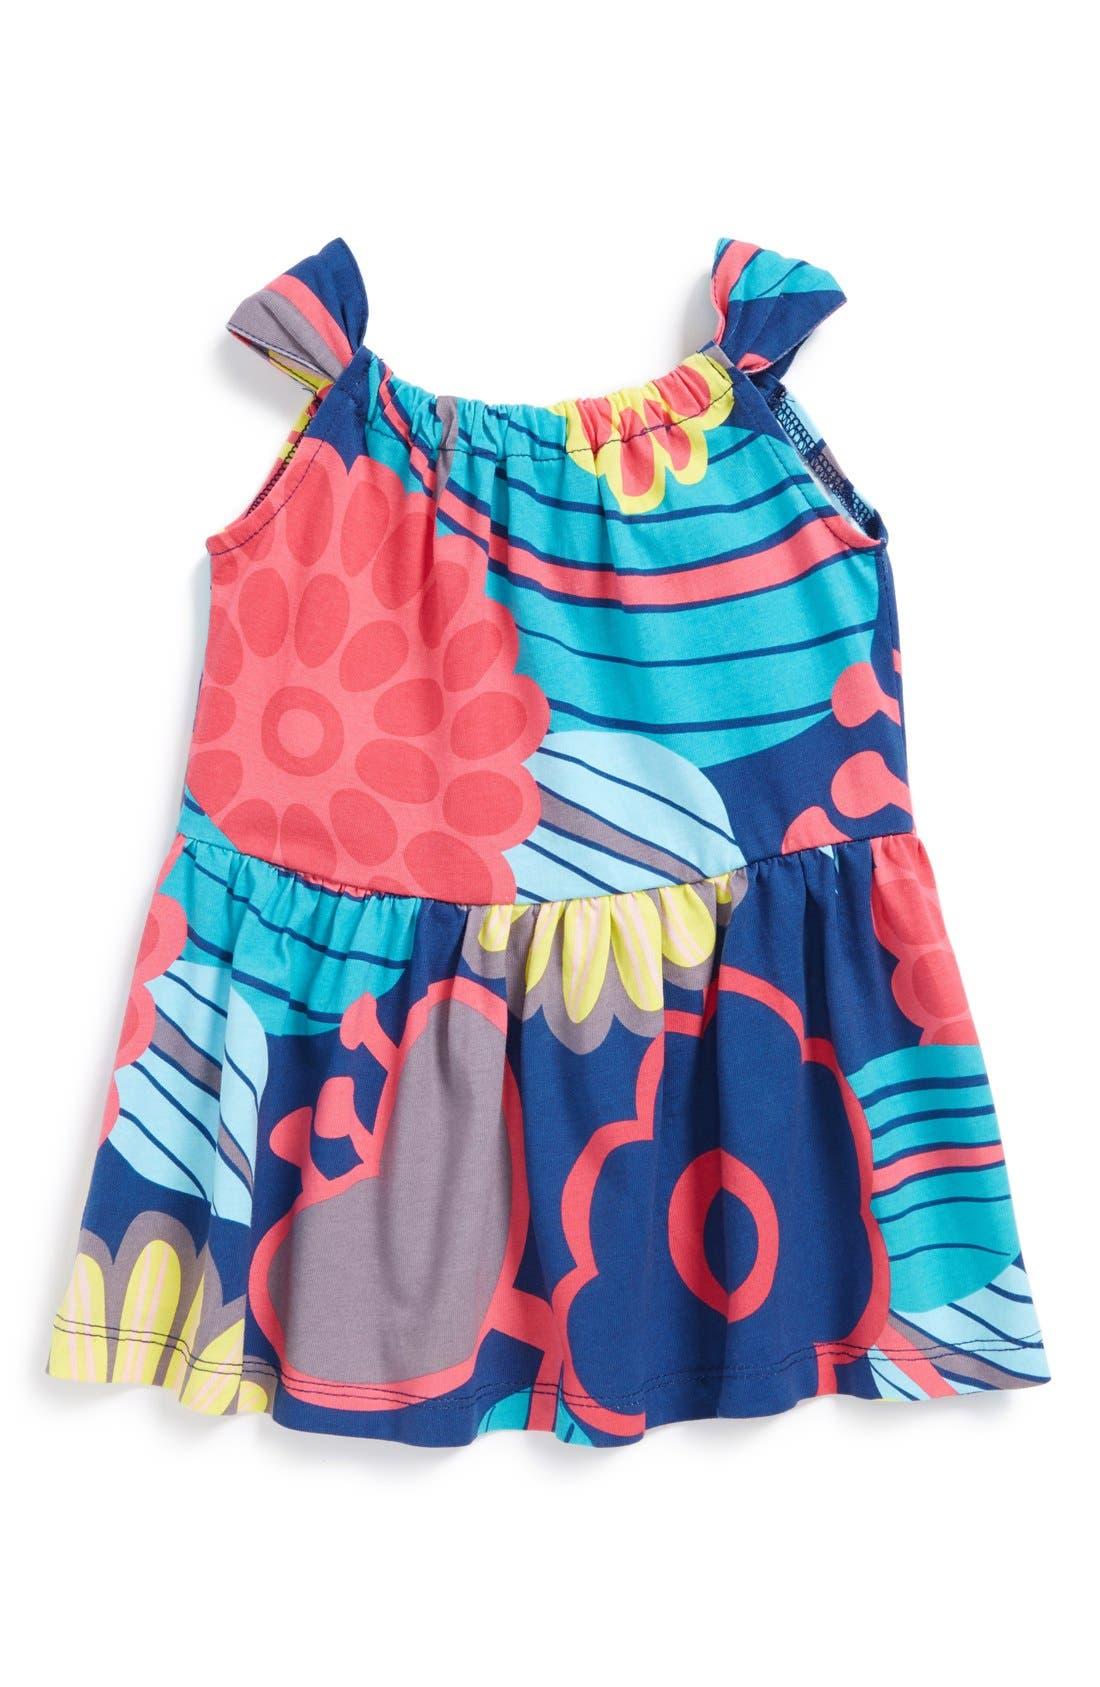 Main Image - Tea Collection 'Mod Gypsy' Twirl Top (Baby Girls)